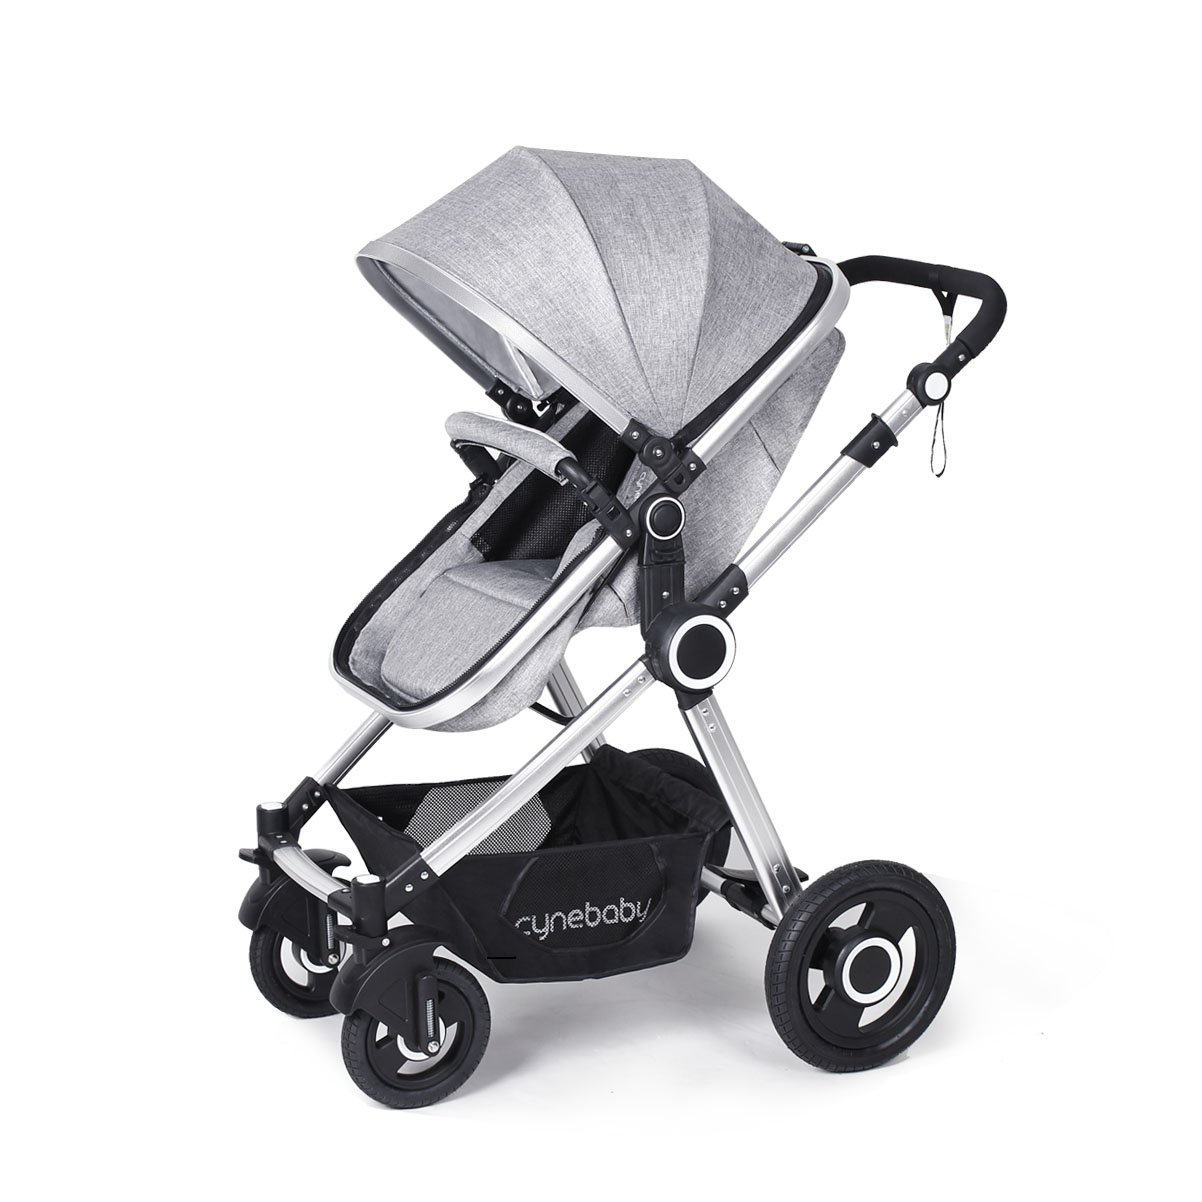 Toddler Stroller Folding Convertible Carriage Infant Anti-Shock High View Luxury Baby Stroller Newborn Pram Stroller Pushchair Stroller for Babies(Grey)